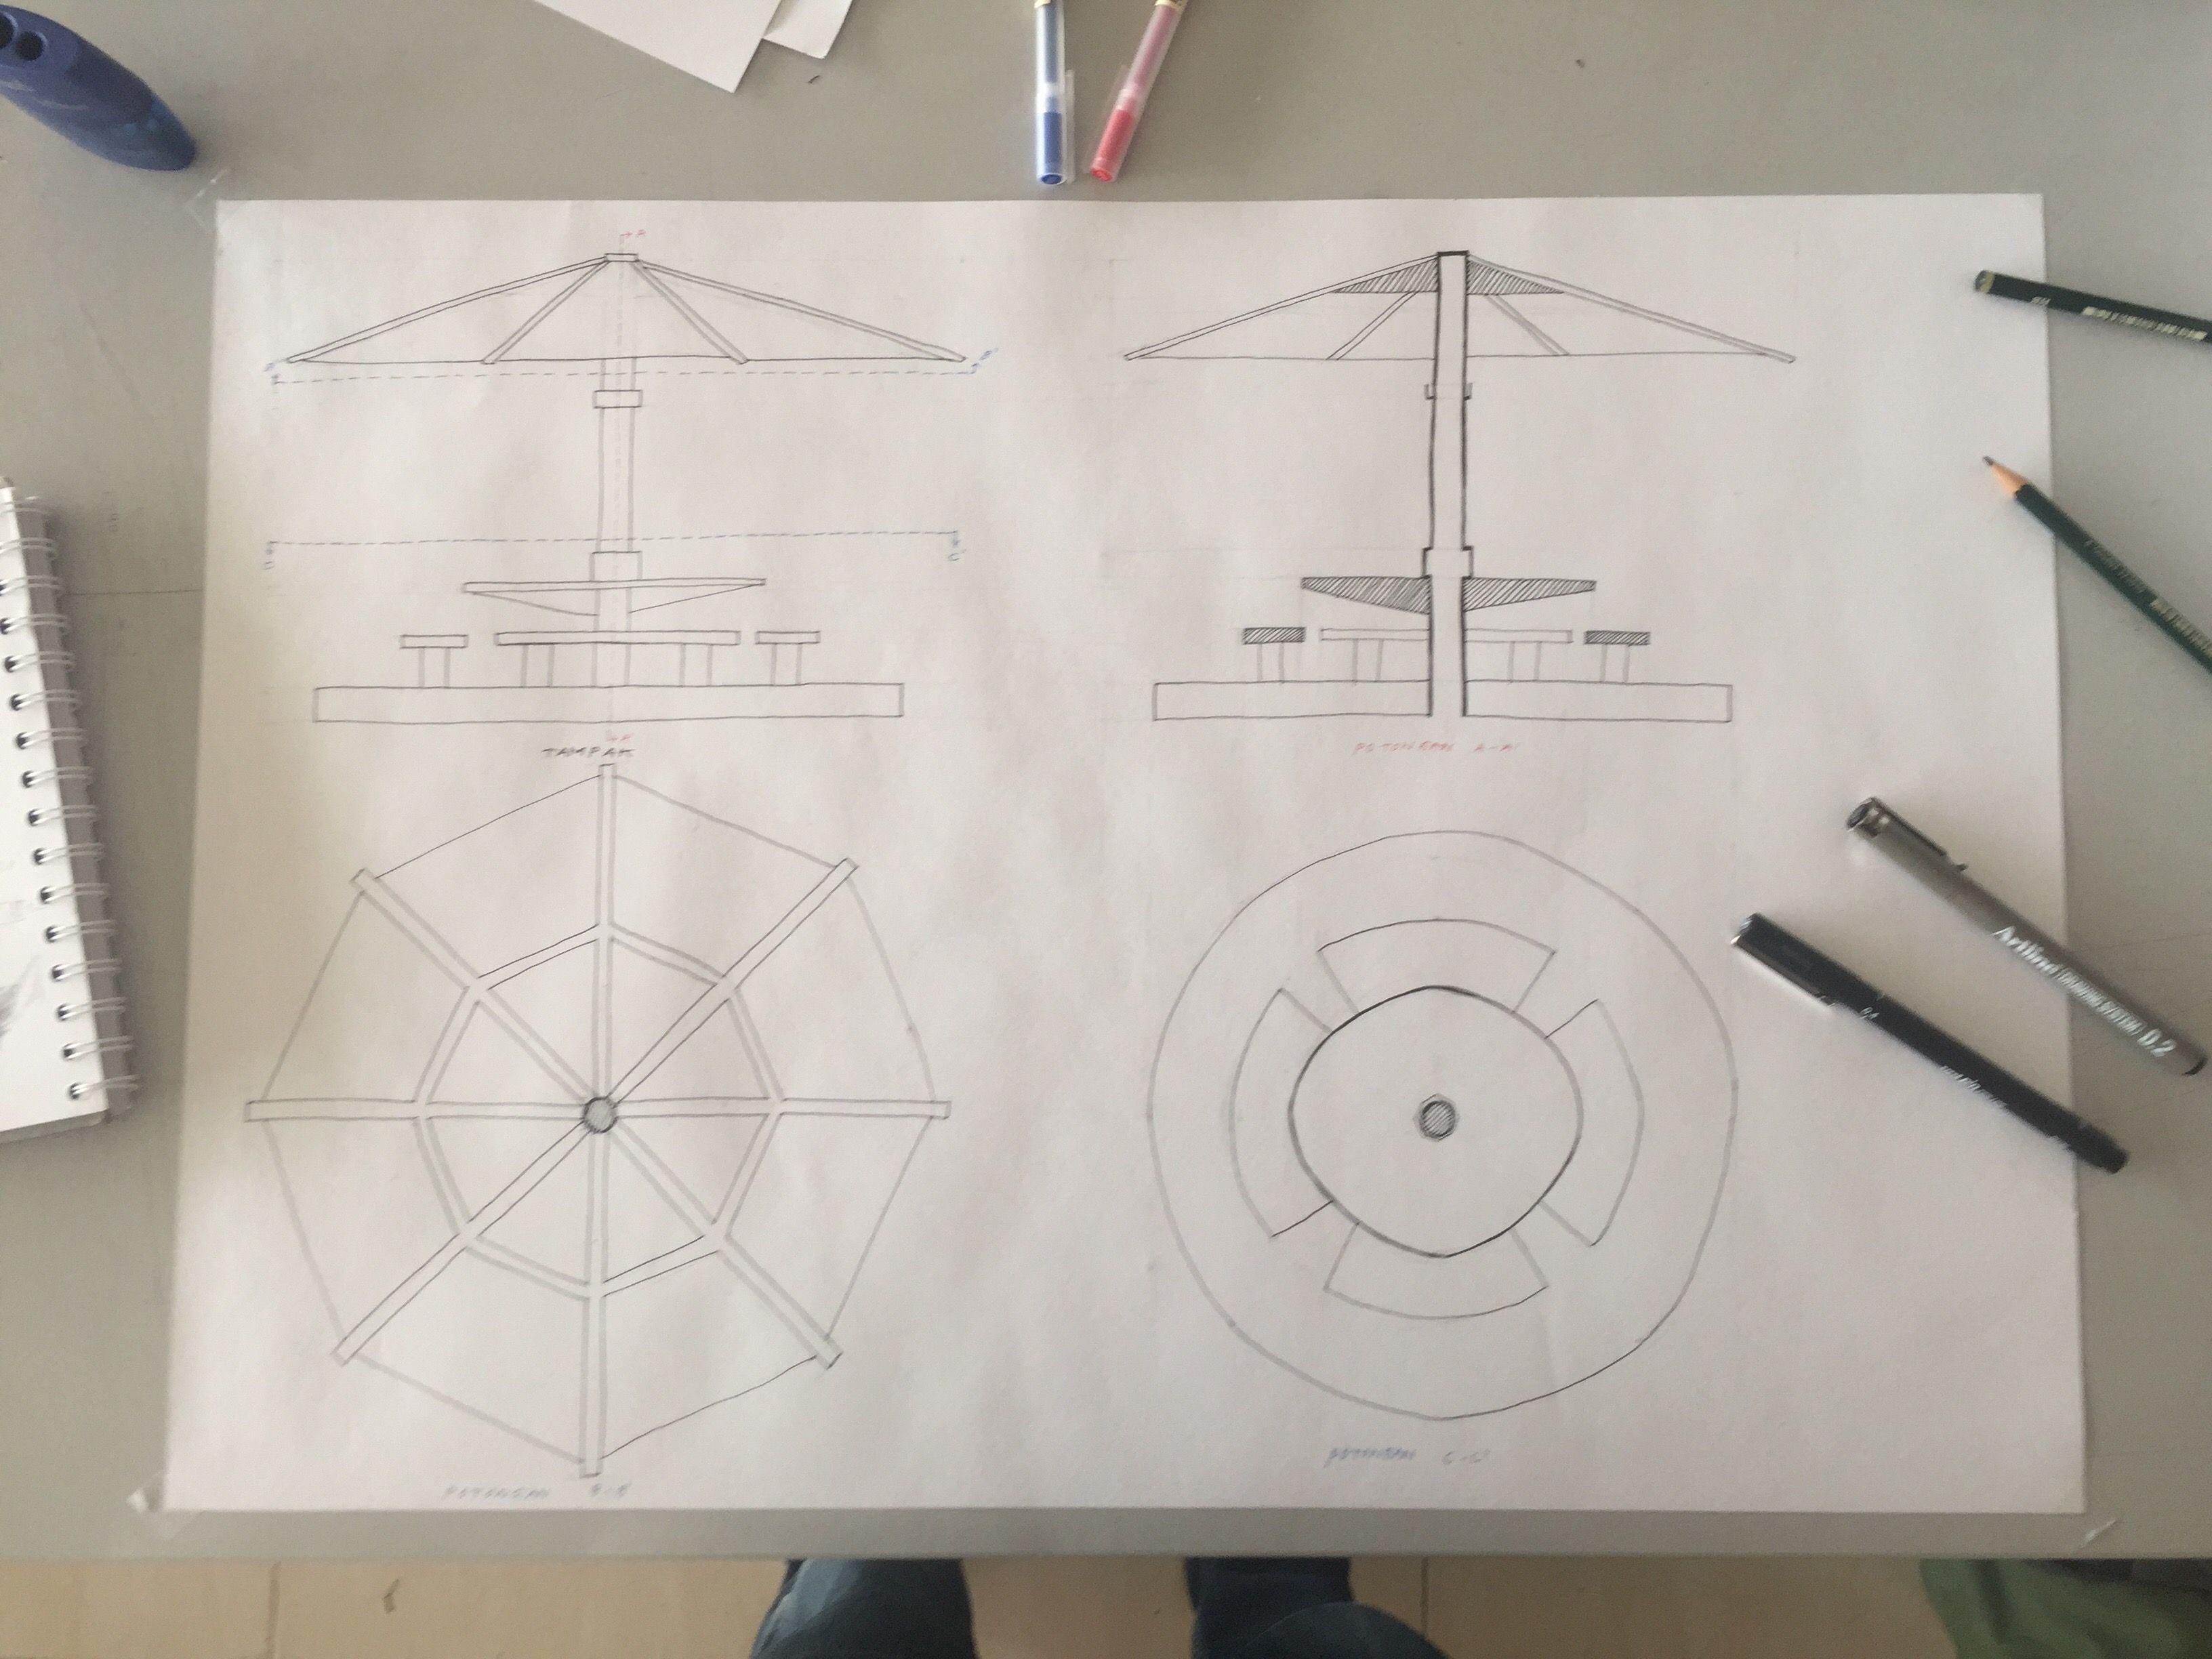 Ortografis Gazebo Section Elevation Plan